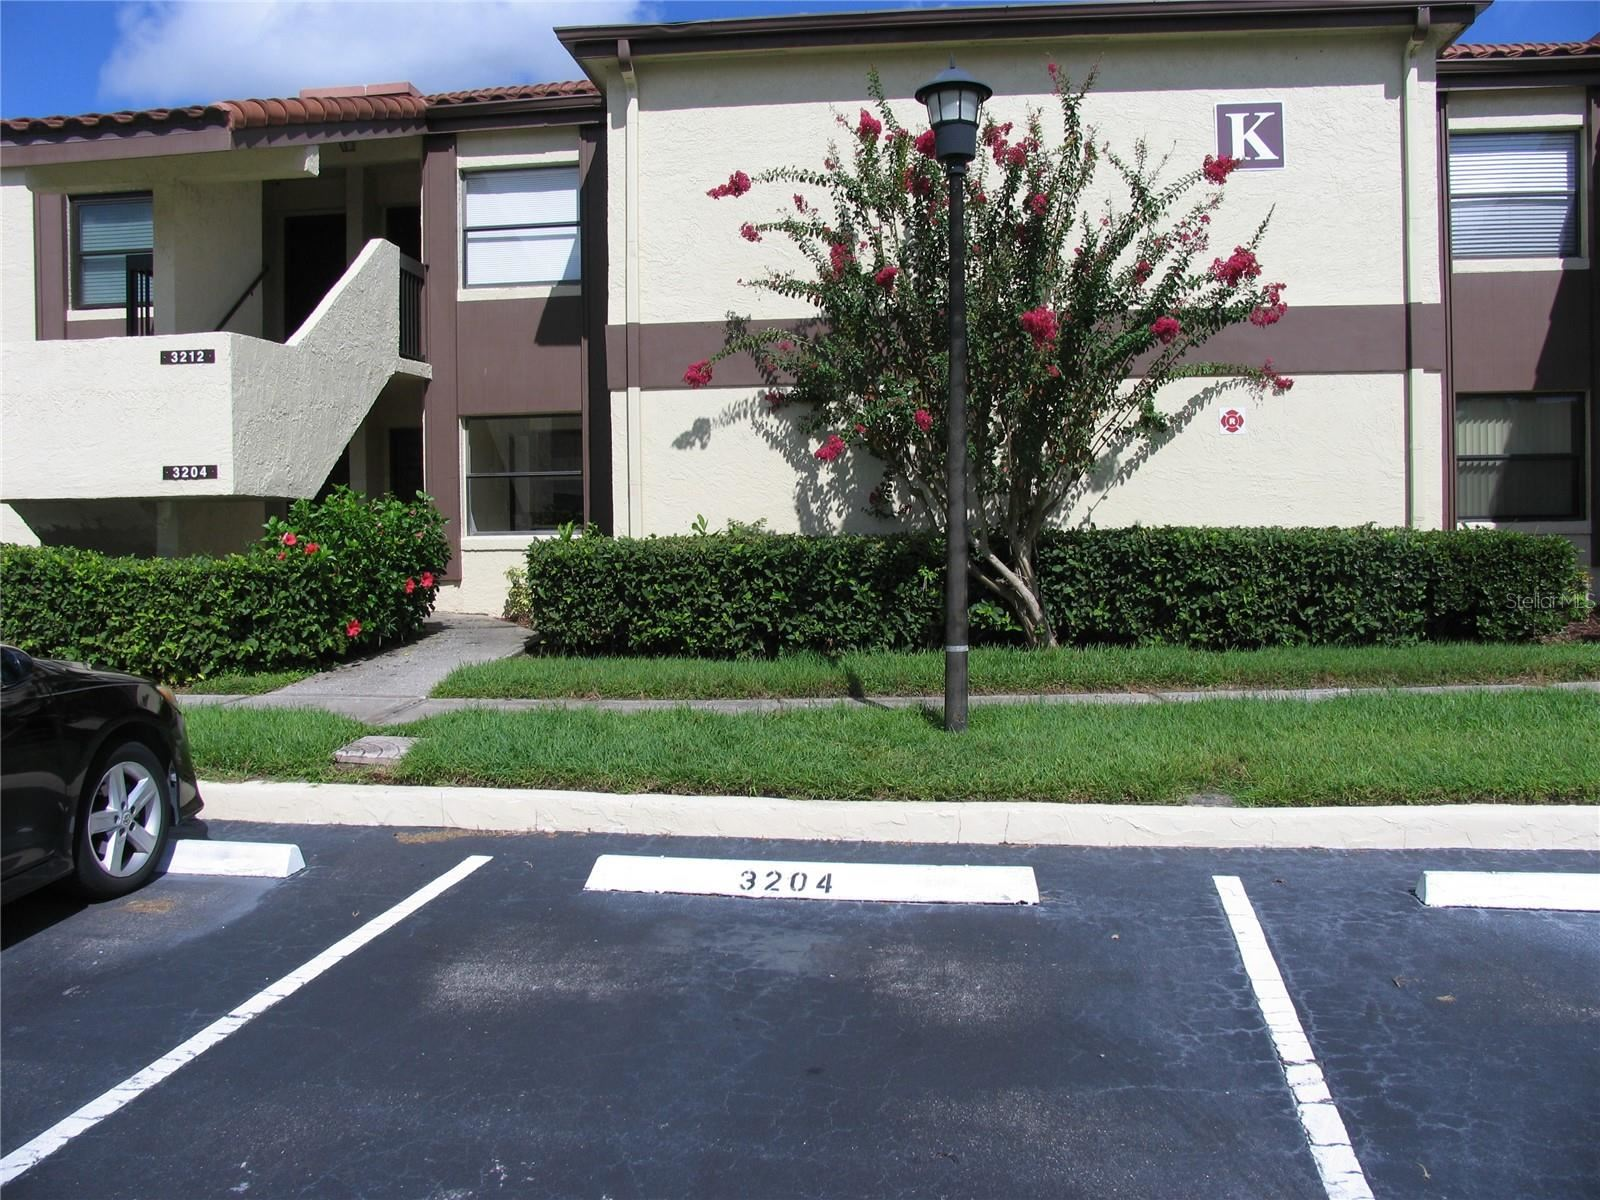 3204 CANDLE RIDGE DRIVE #102, Orlando, FL 32822 - #: O5975447